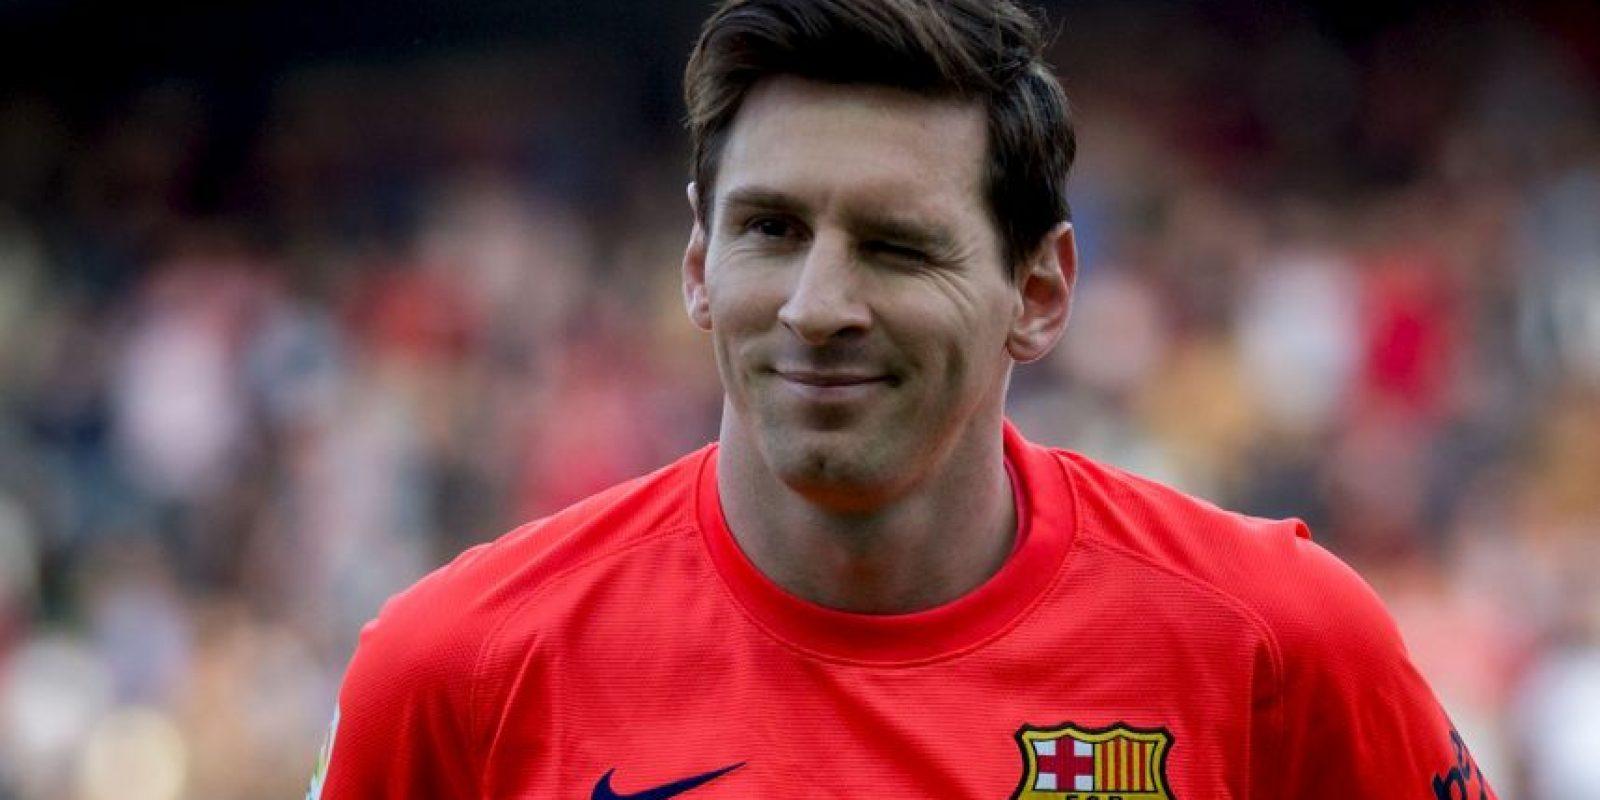 Lionel Messi, futbolista argentino. Foto:Getty Images